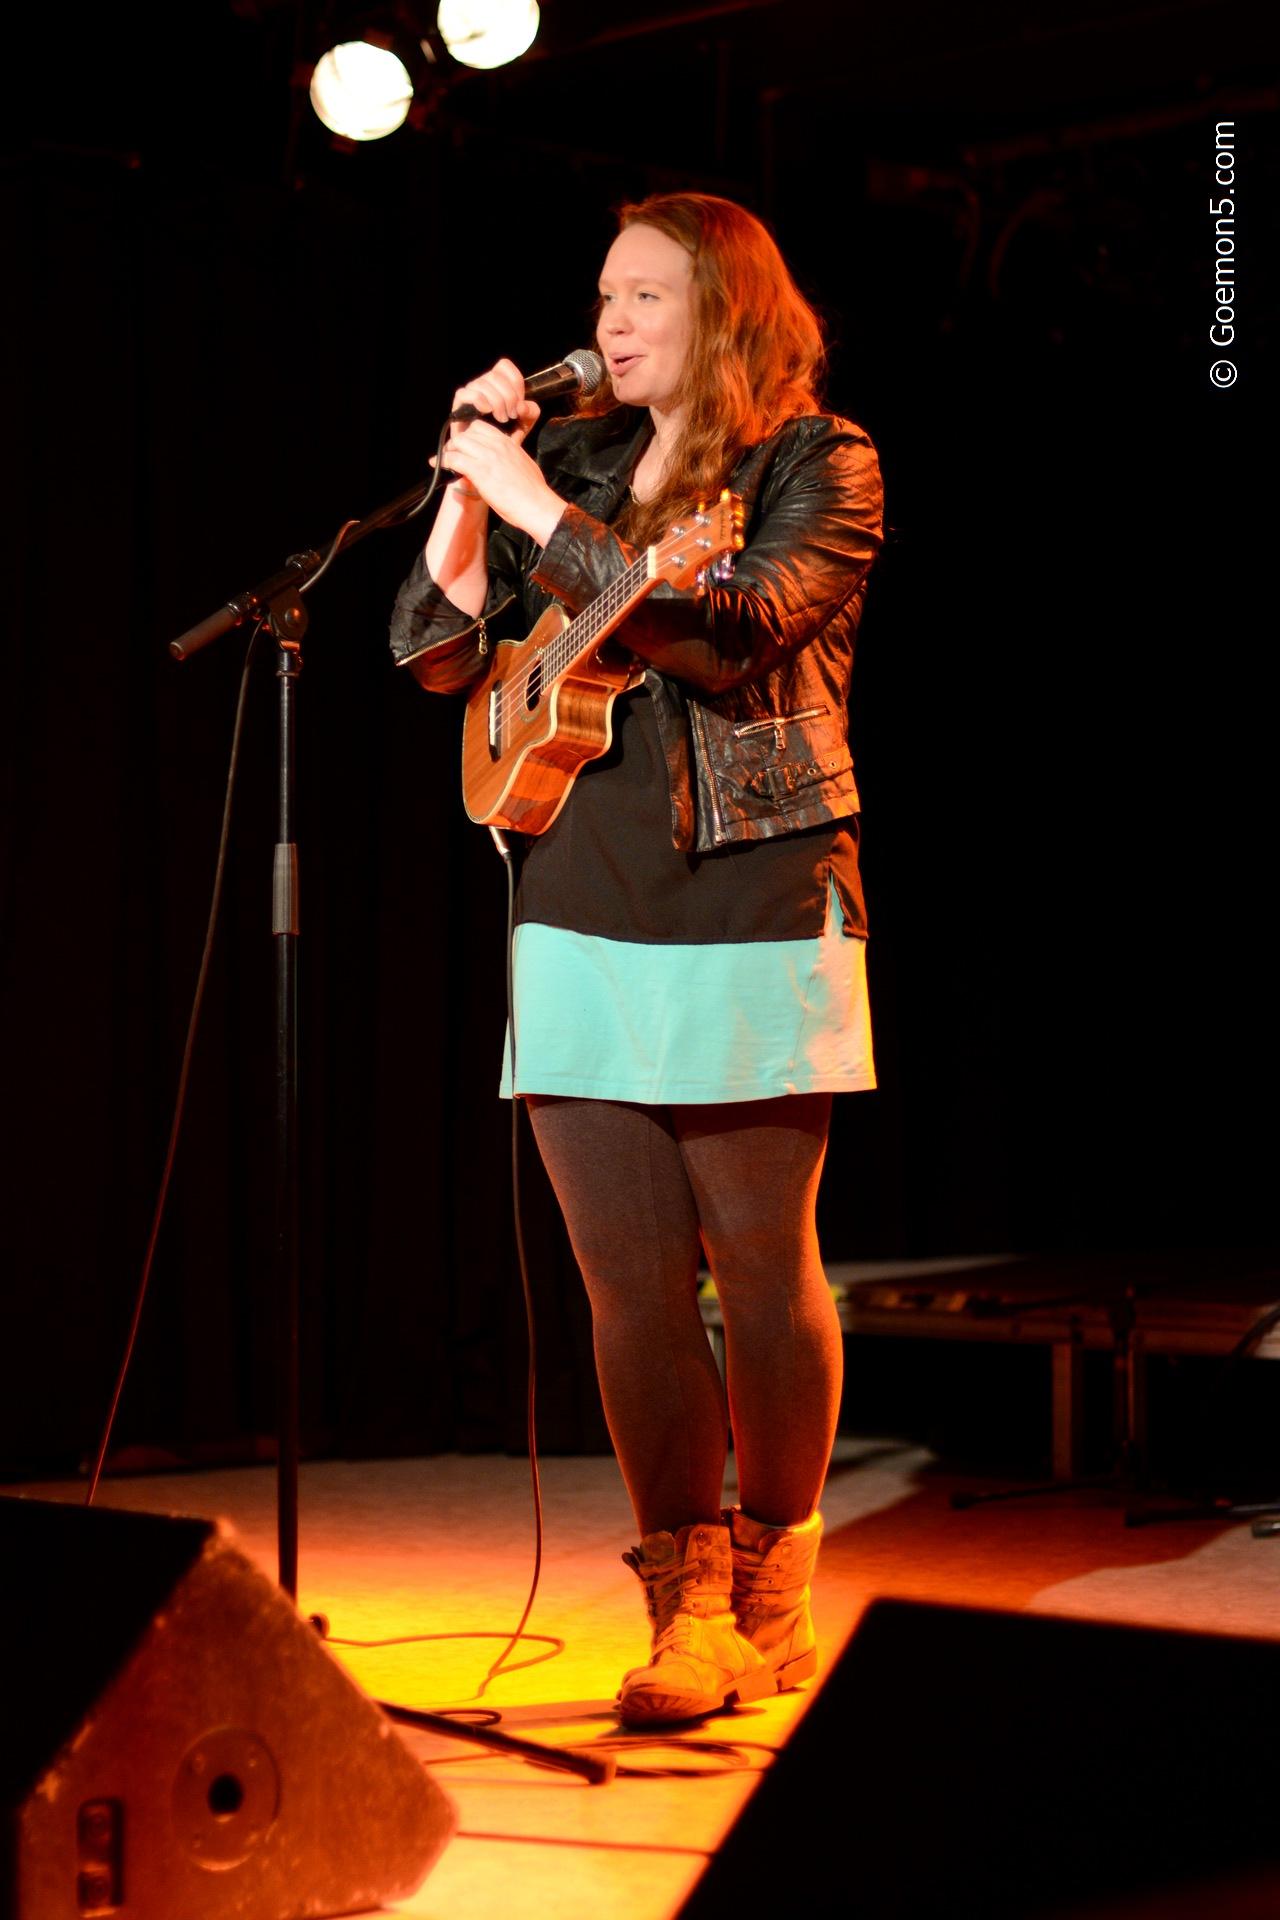 Kelsey Brae at ParkClub 8